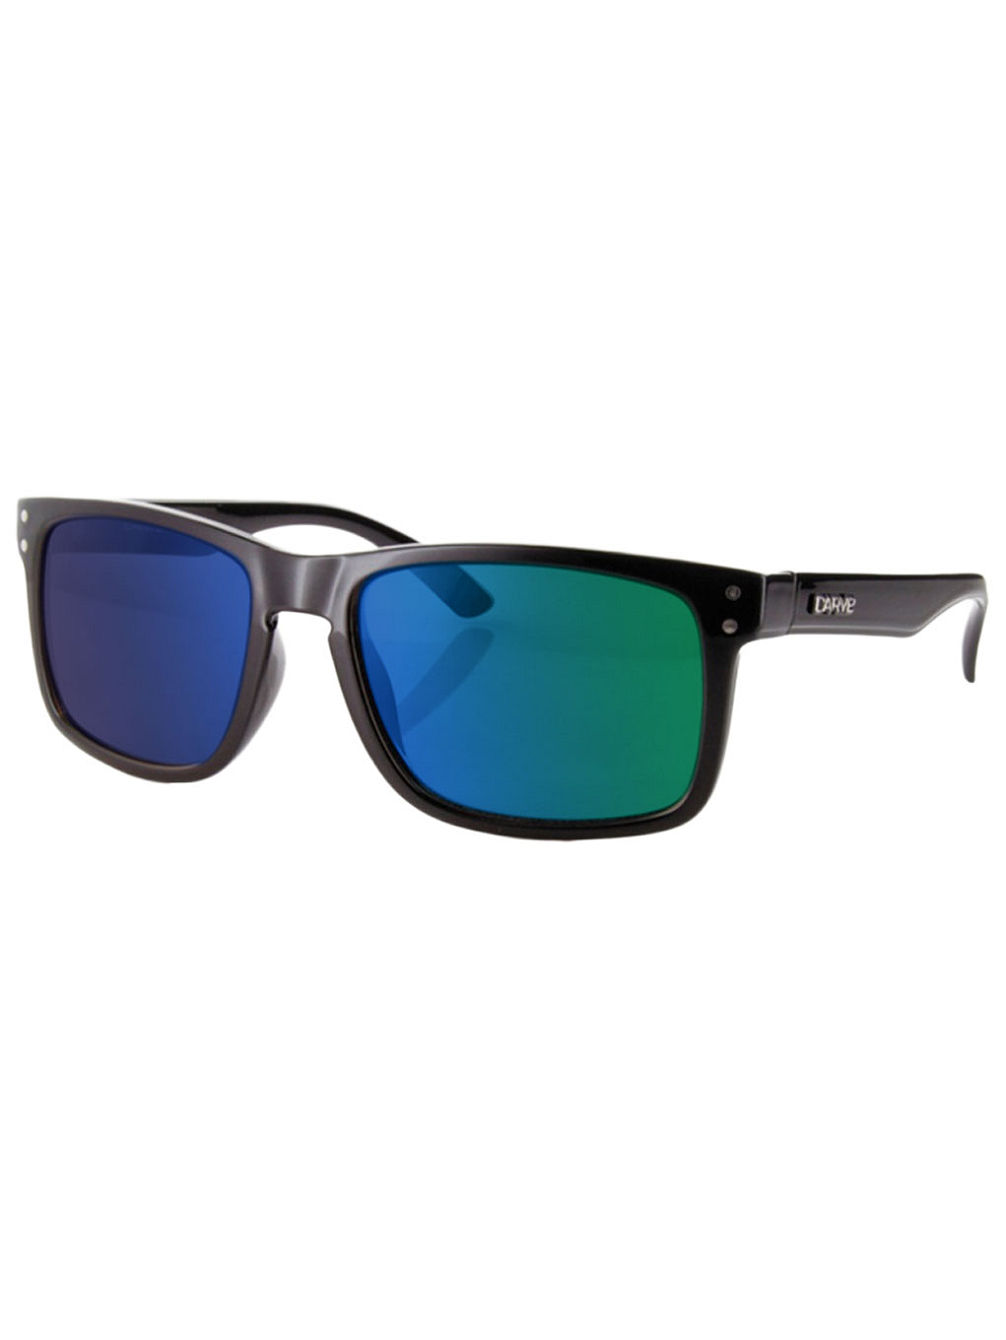 Carve Goblin Sunglasses Review Www Tapdance Org